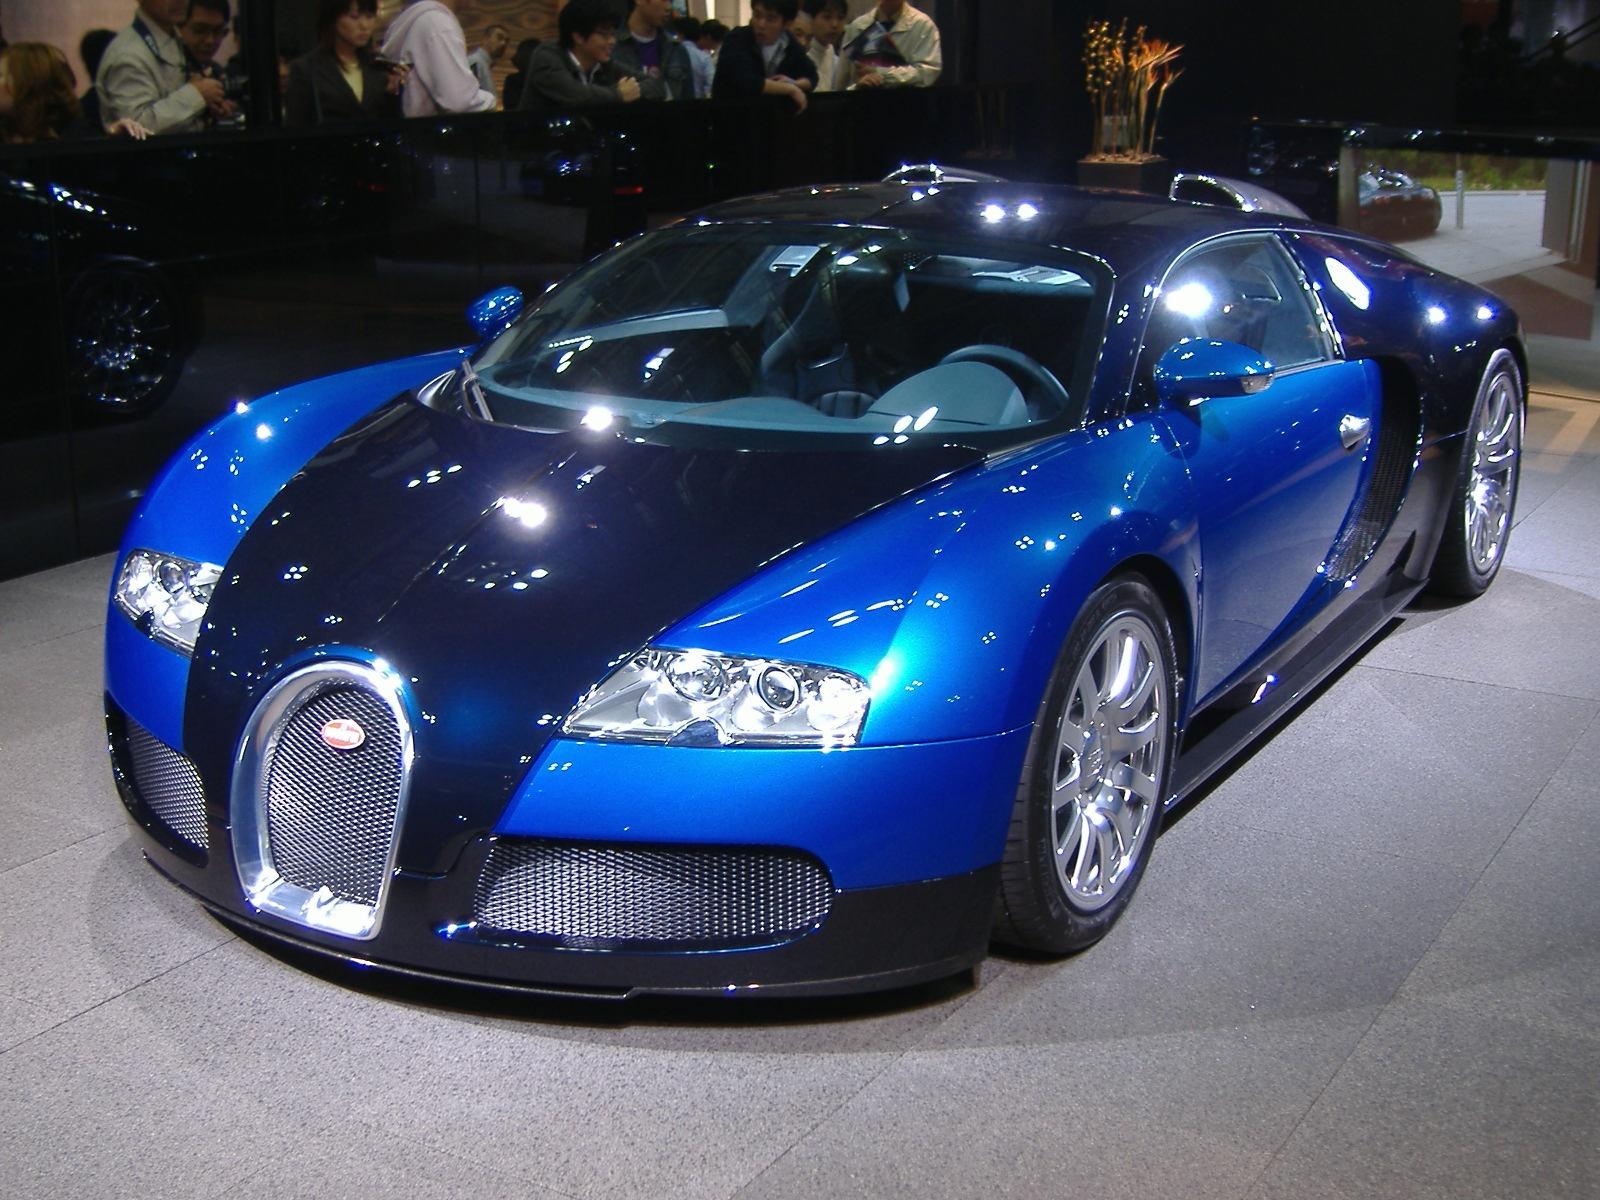 Bugatti images Bugatti Veyron ;) HD wallpaper and background photos